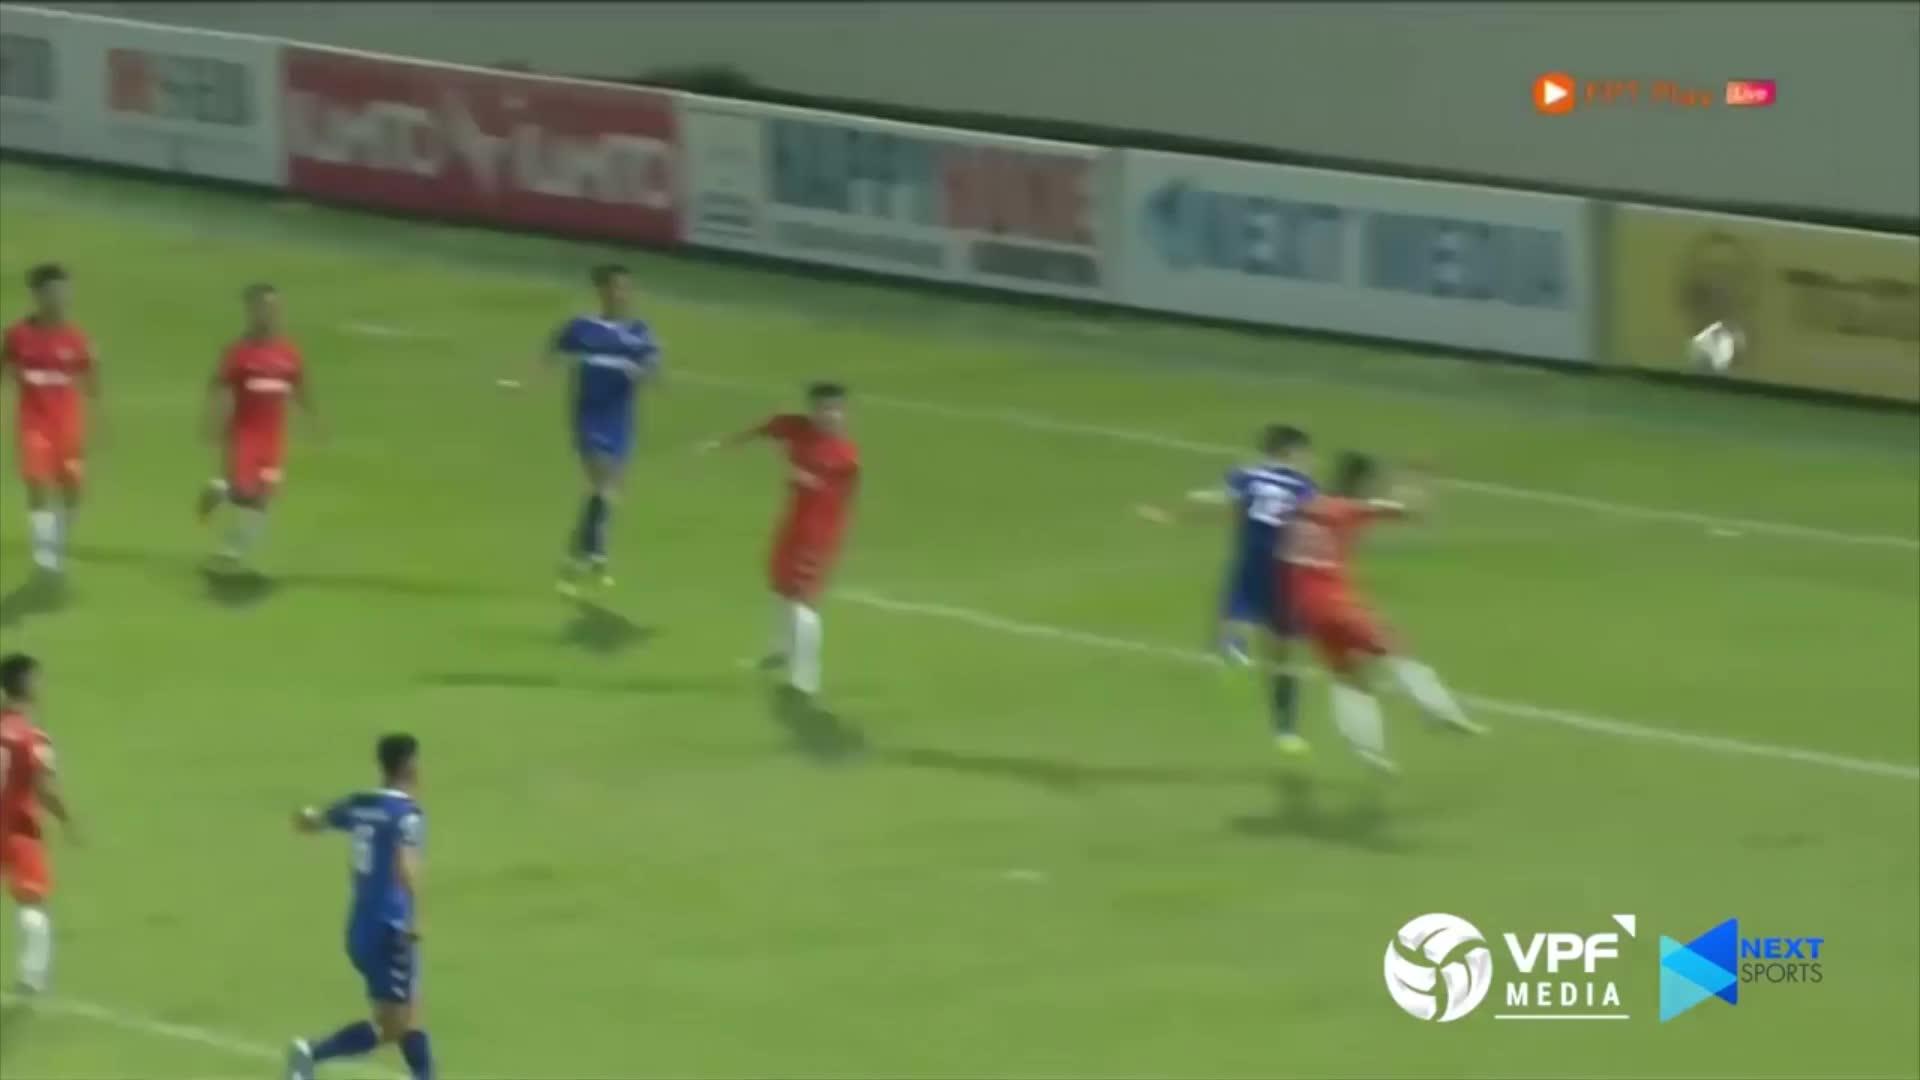 video 5 ban thang dep nhat vong 25 v league 2019